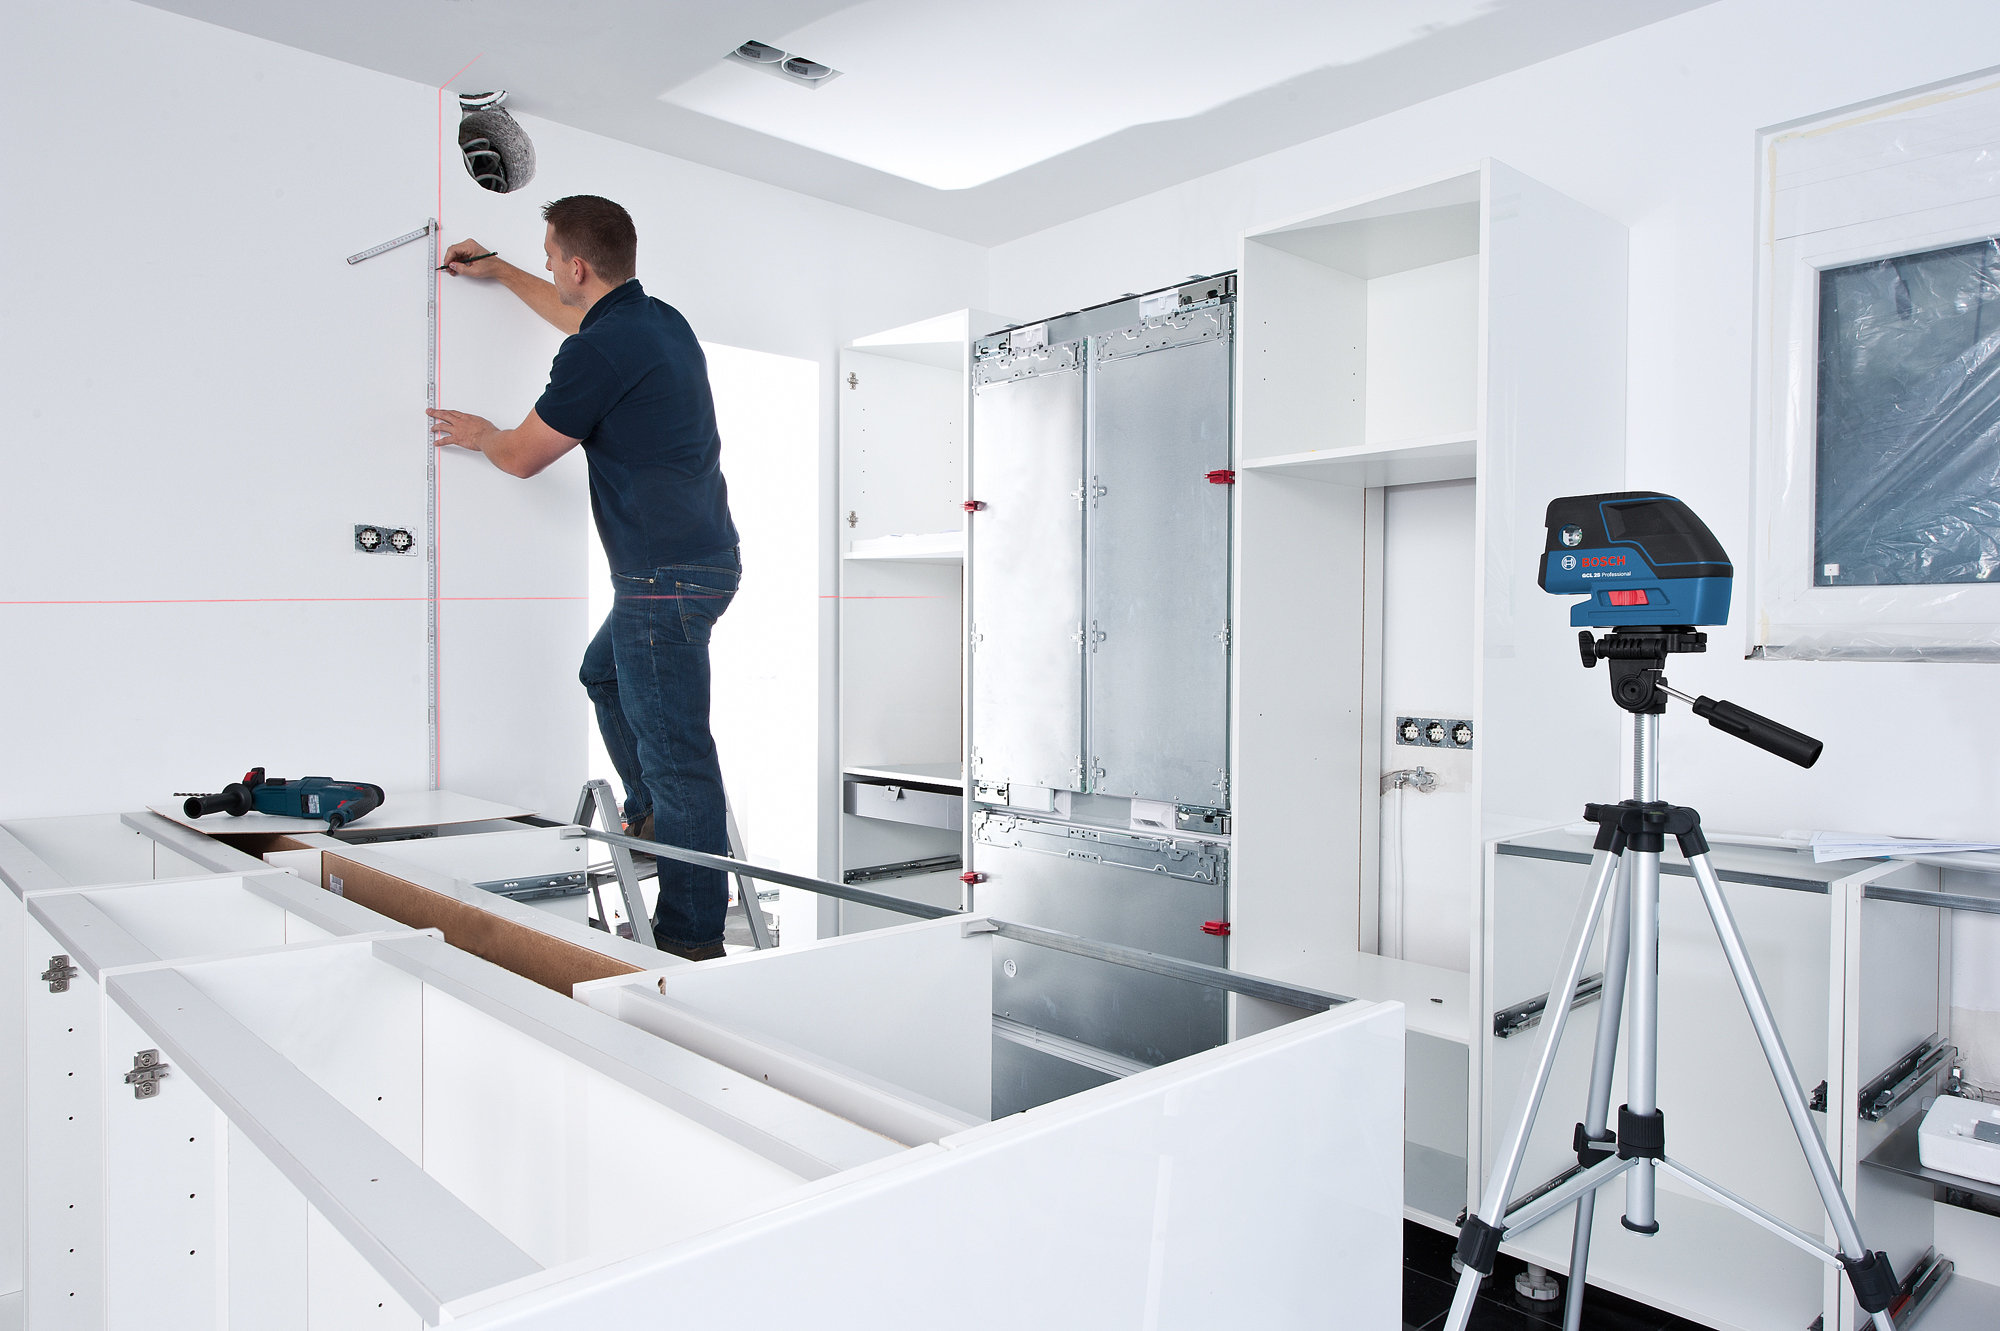 Amazon Com Bosch Gcl25 Self Leveling 5 Point Alignment